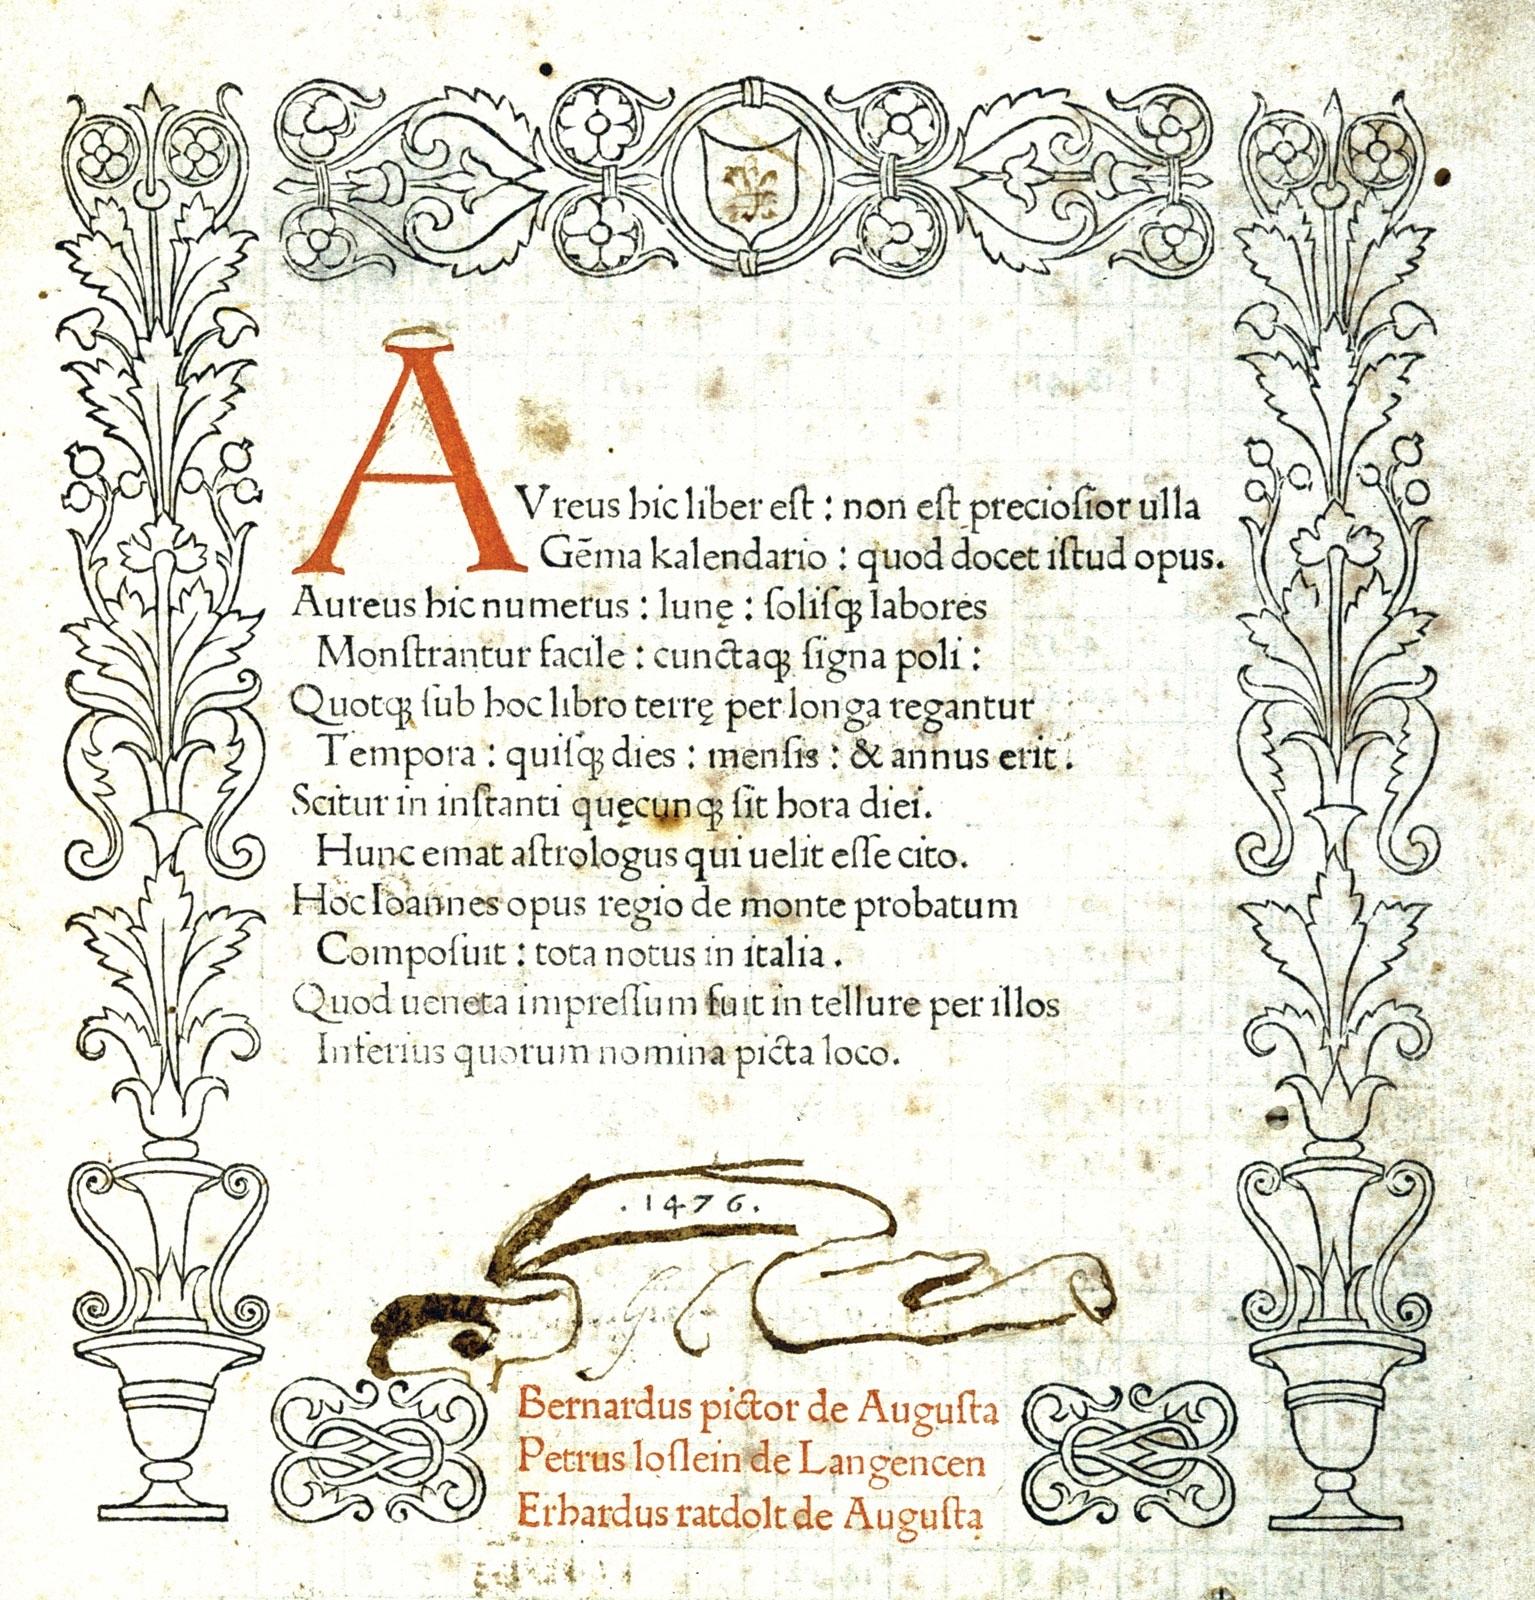 Calendar | Chronology | Britannica with How Many Days In Liturgical Calendar Compared To Regular Calendar